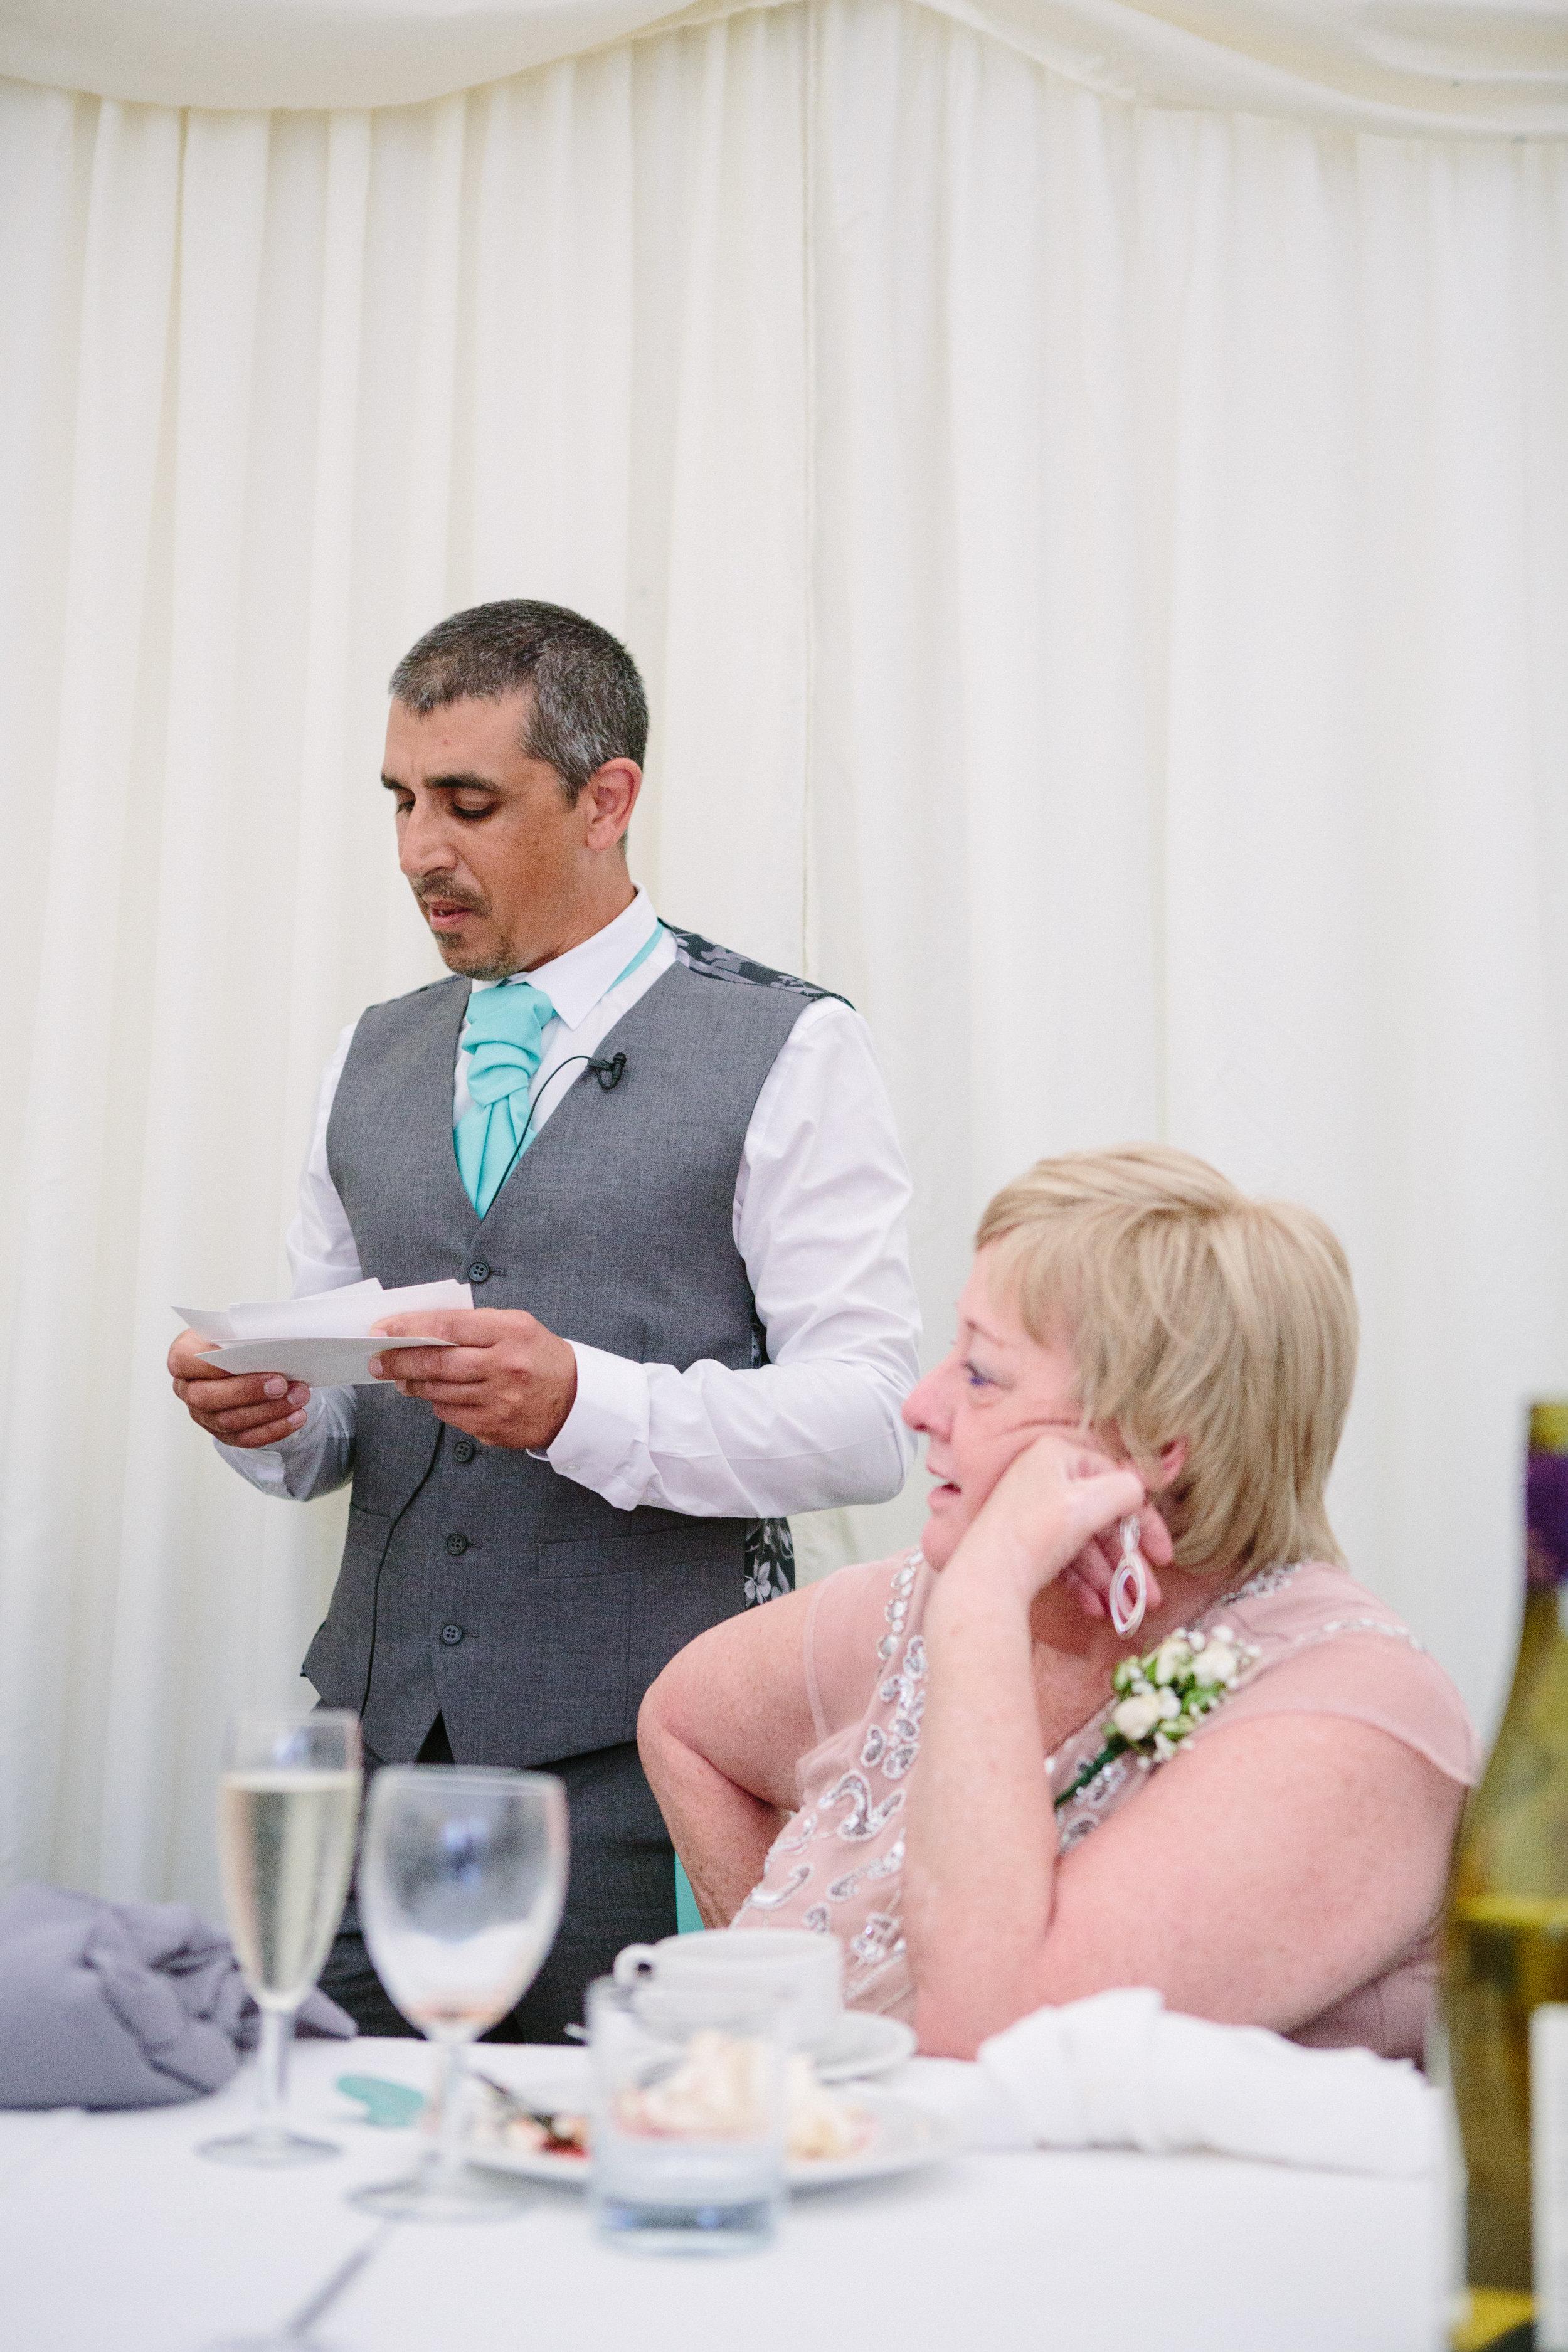 westenhangar-castle-kent-london-wedding-photography-speeches-64